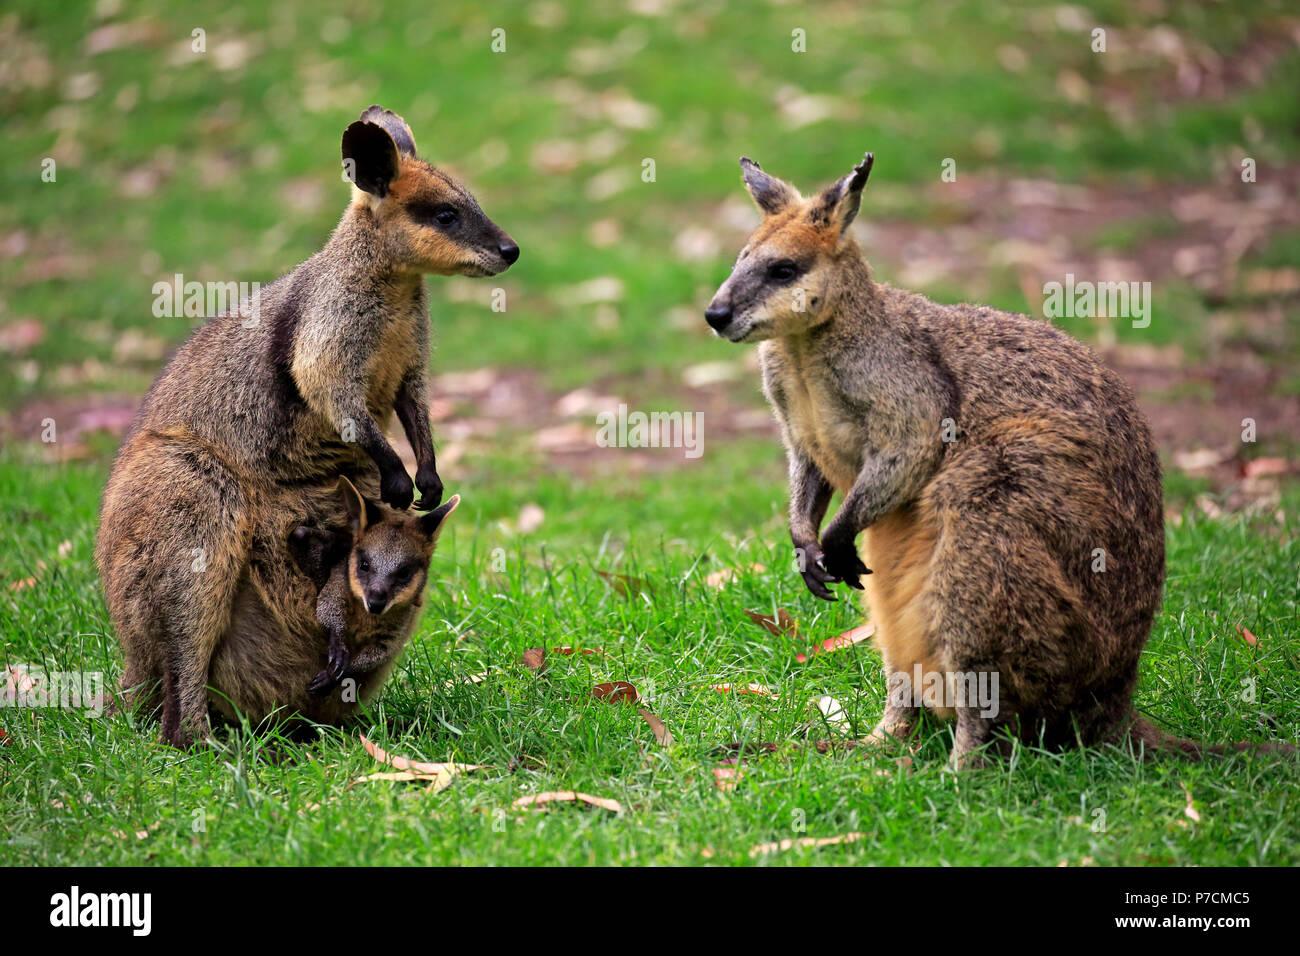 Wallaby ágil, con Joey en bolsa familia, hombres, mujeres, peluches Creek, Australia Meridional, Australia (Macropus agilis) Imagen De Stock